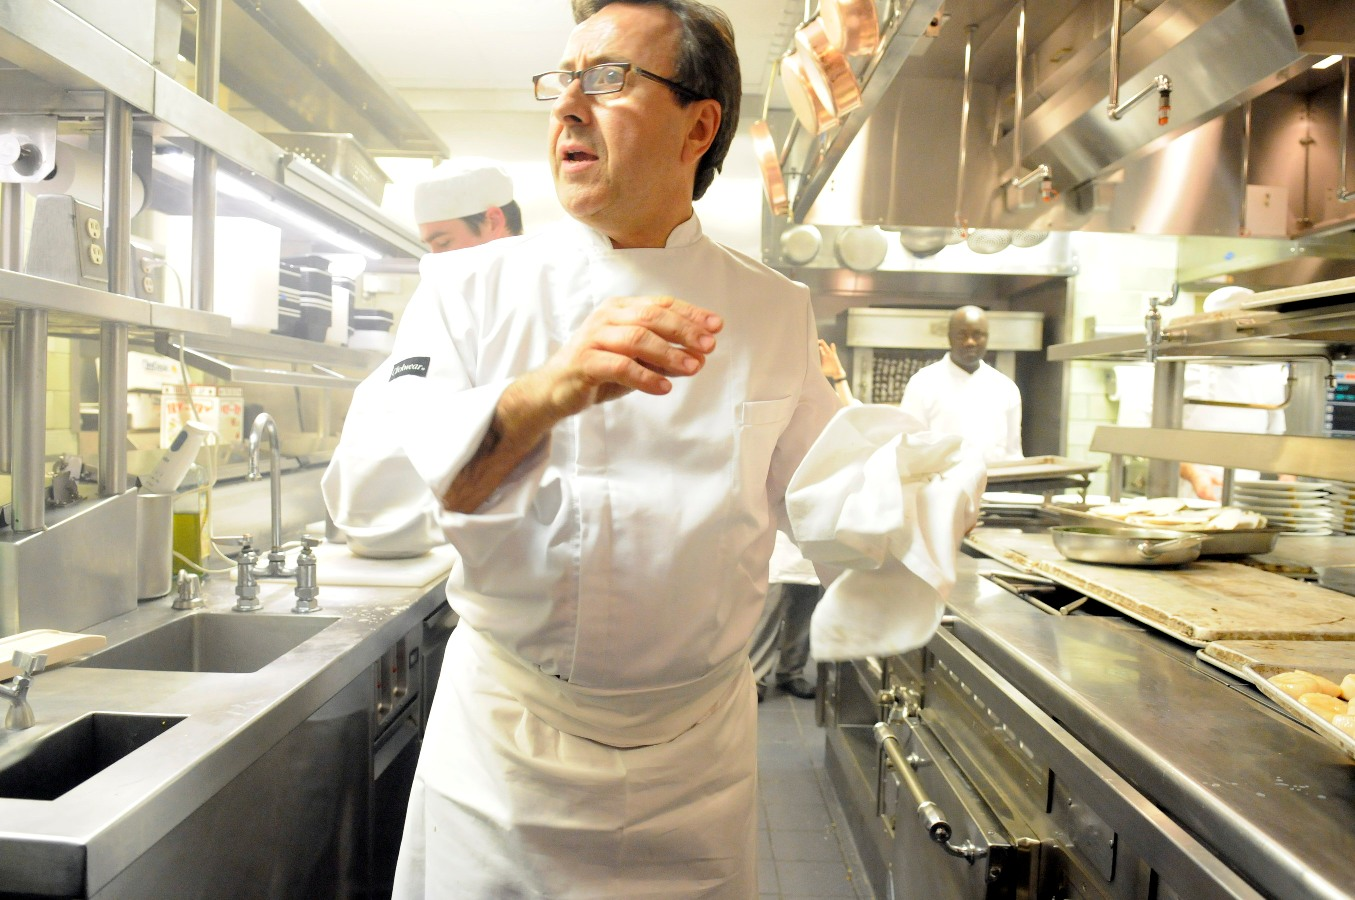 Daniel Boulud 32 Star Dinner 2010 In His Kitchen